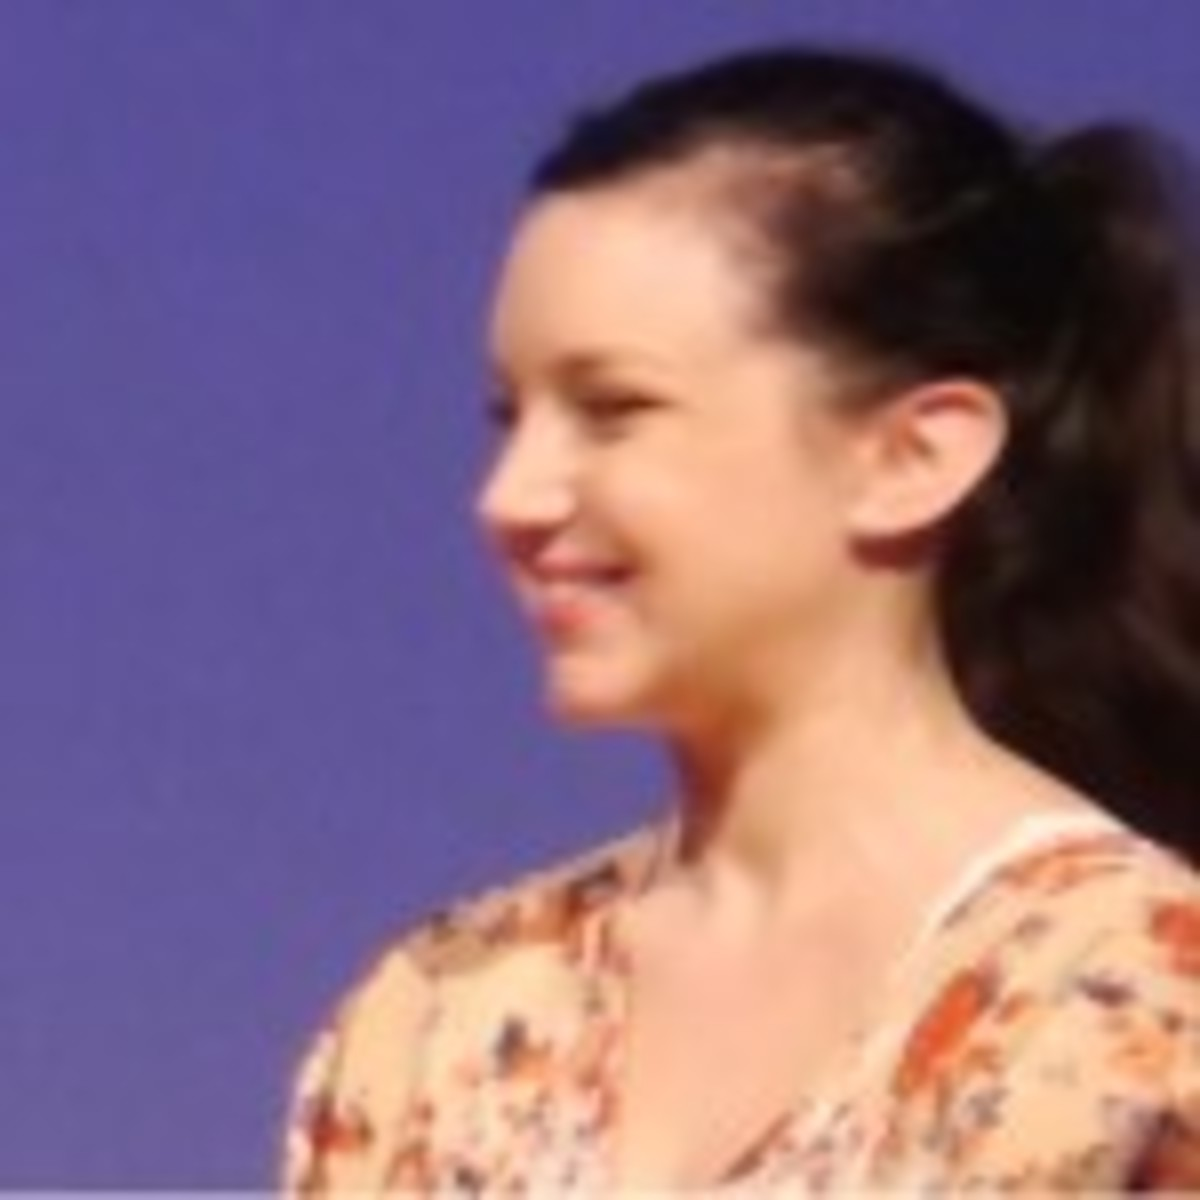 Actress ClaudiaLevy